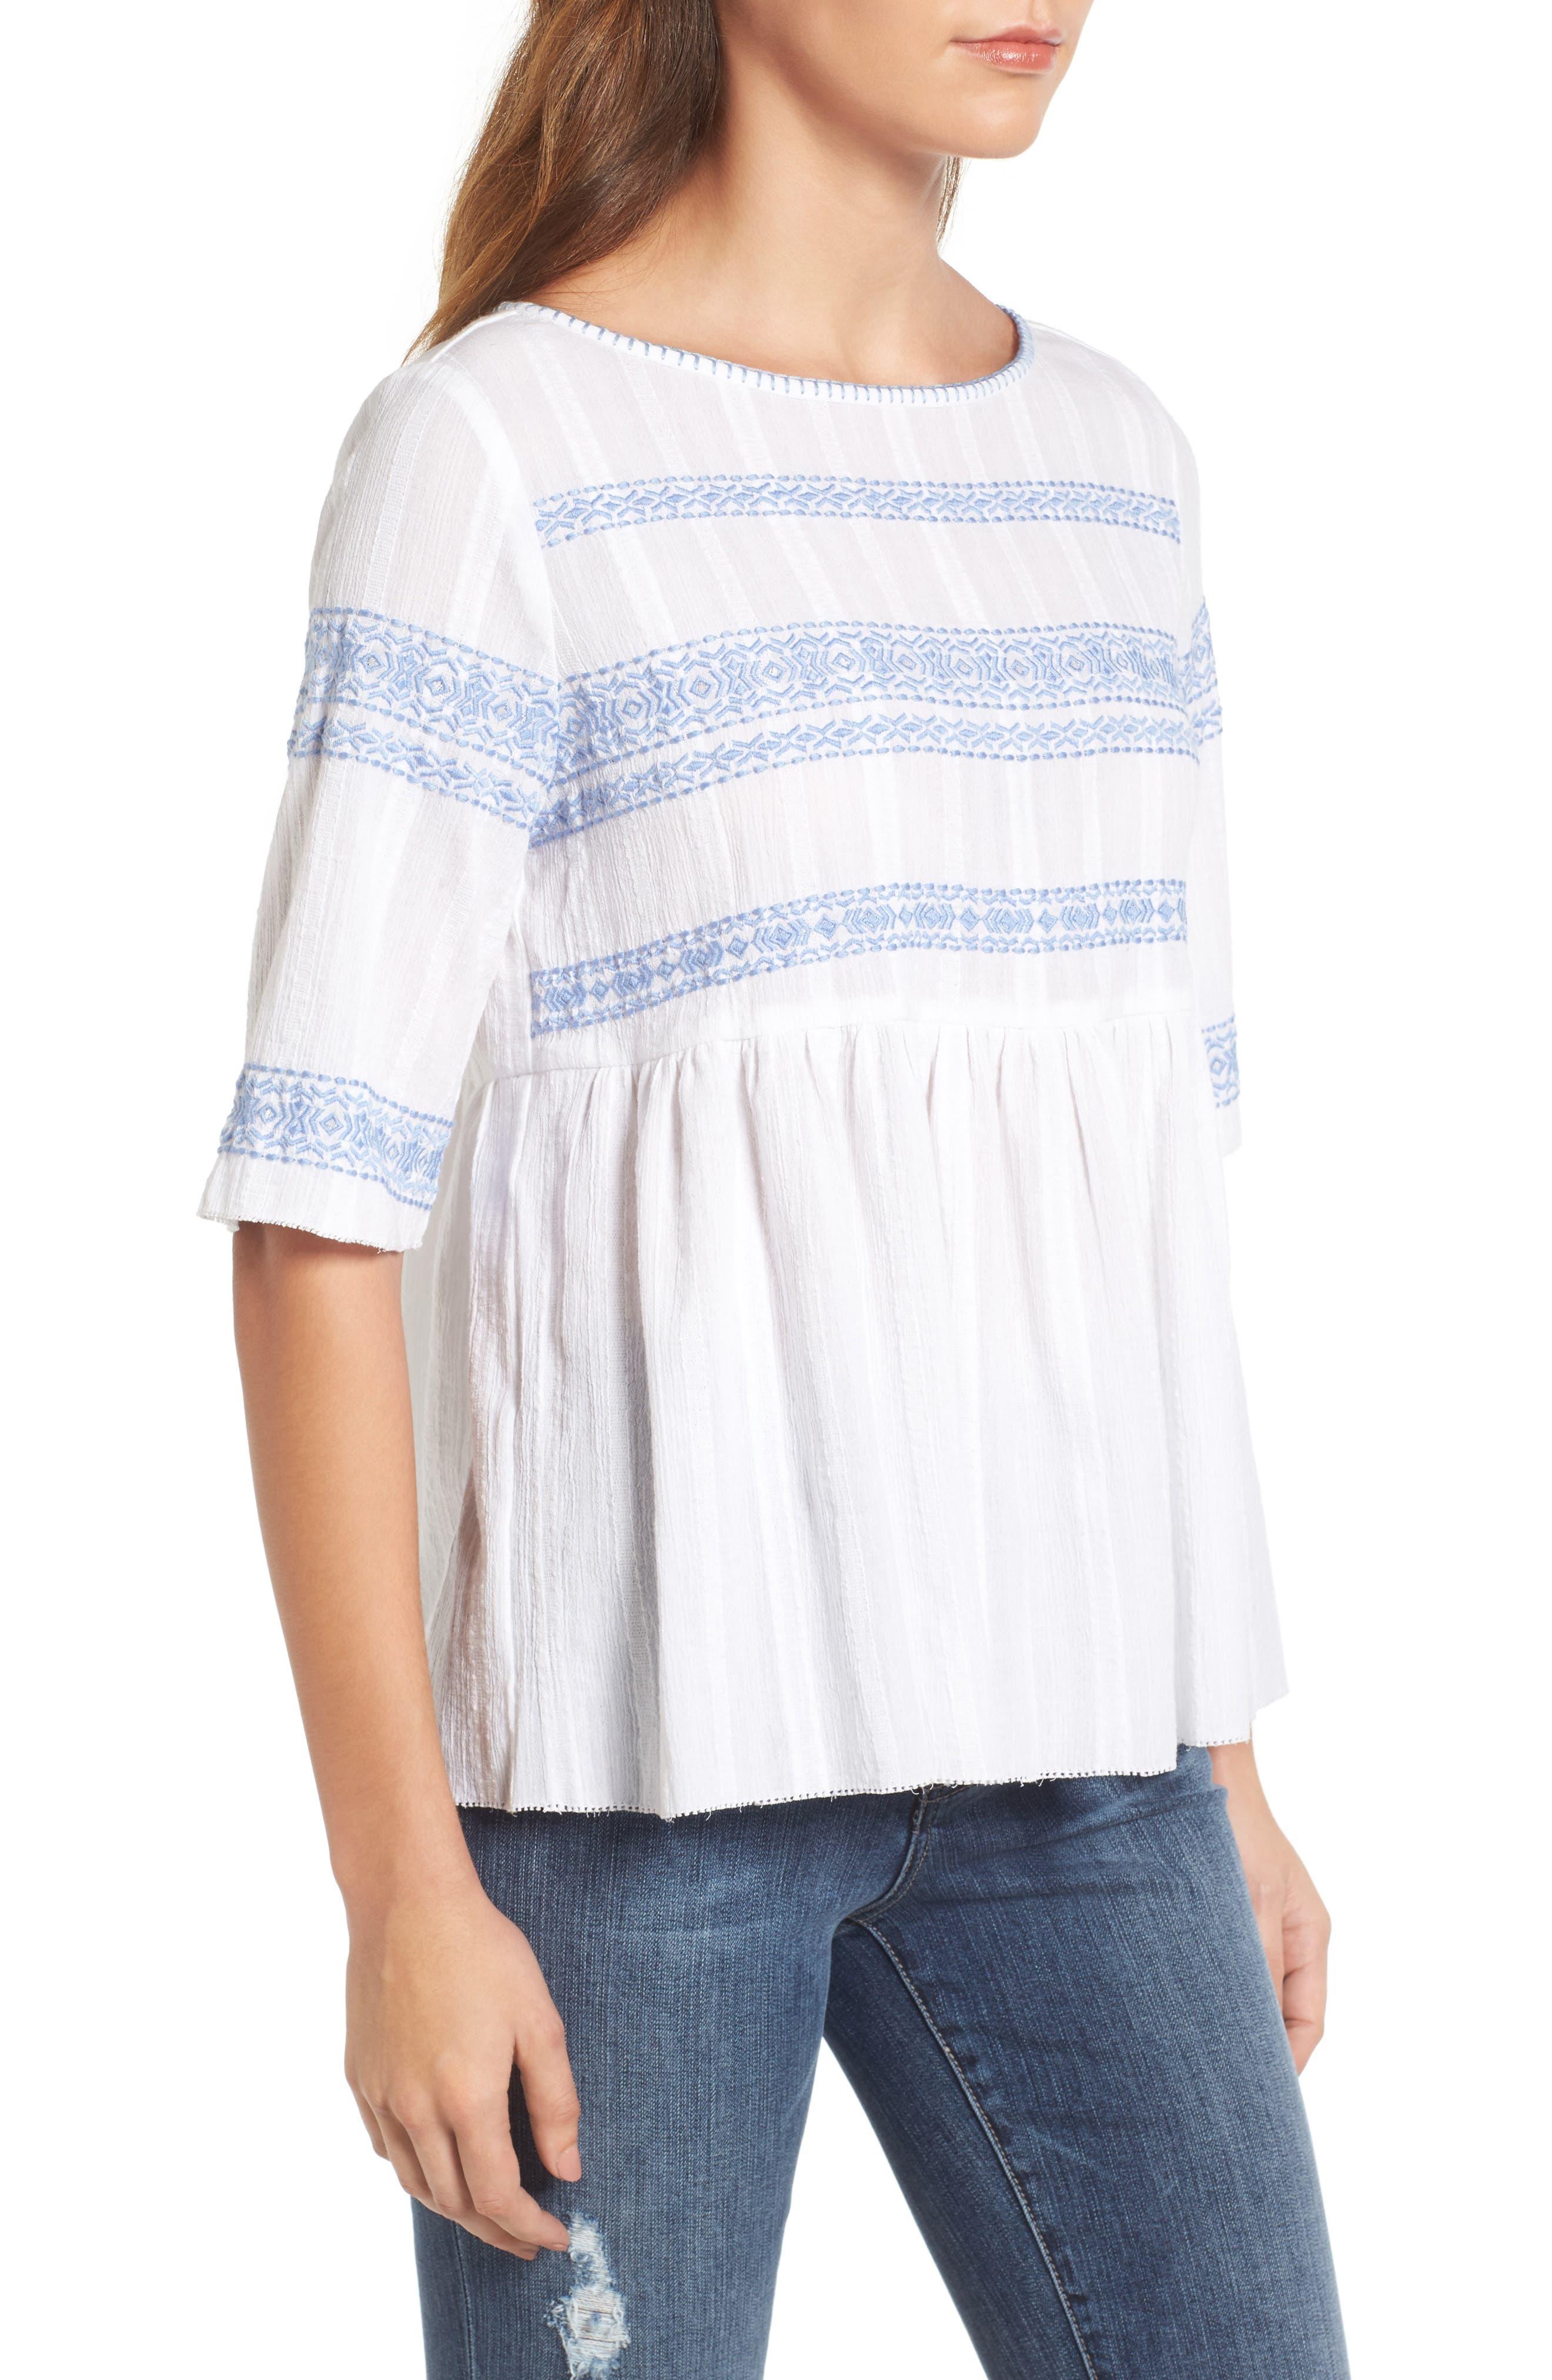 Alternate Image 3  - Caslon® Embroidered Babydoll Top (Regular & Petite)